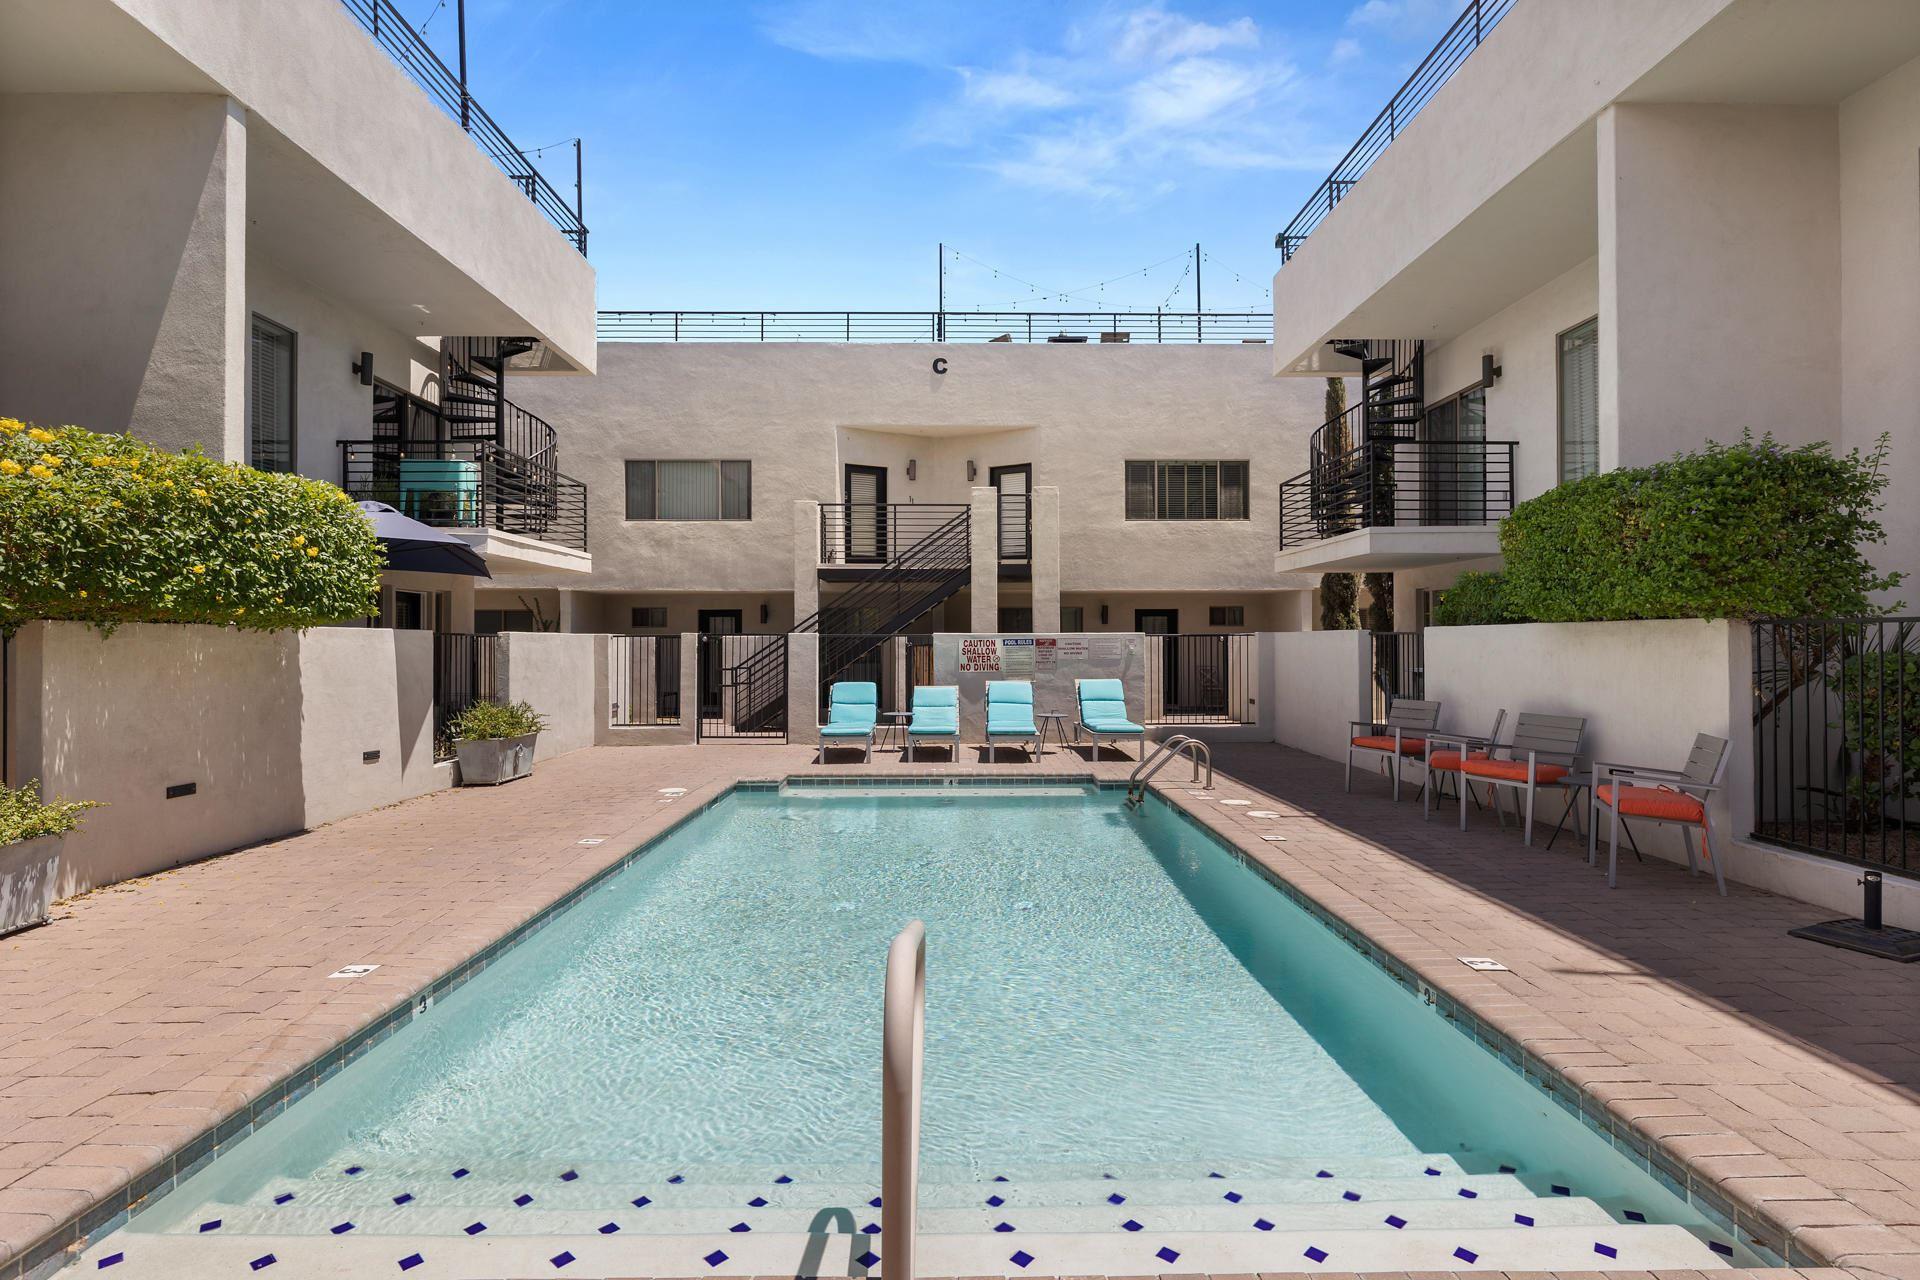 3635 N 68TH Street #12, Scottsdale, AZ 85251 - MLS#: 6232063